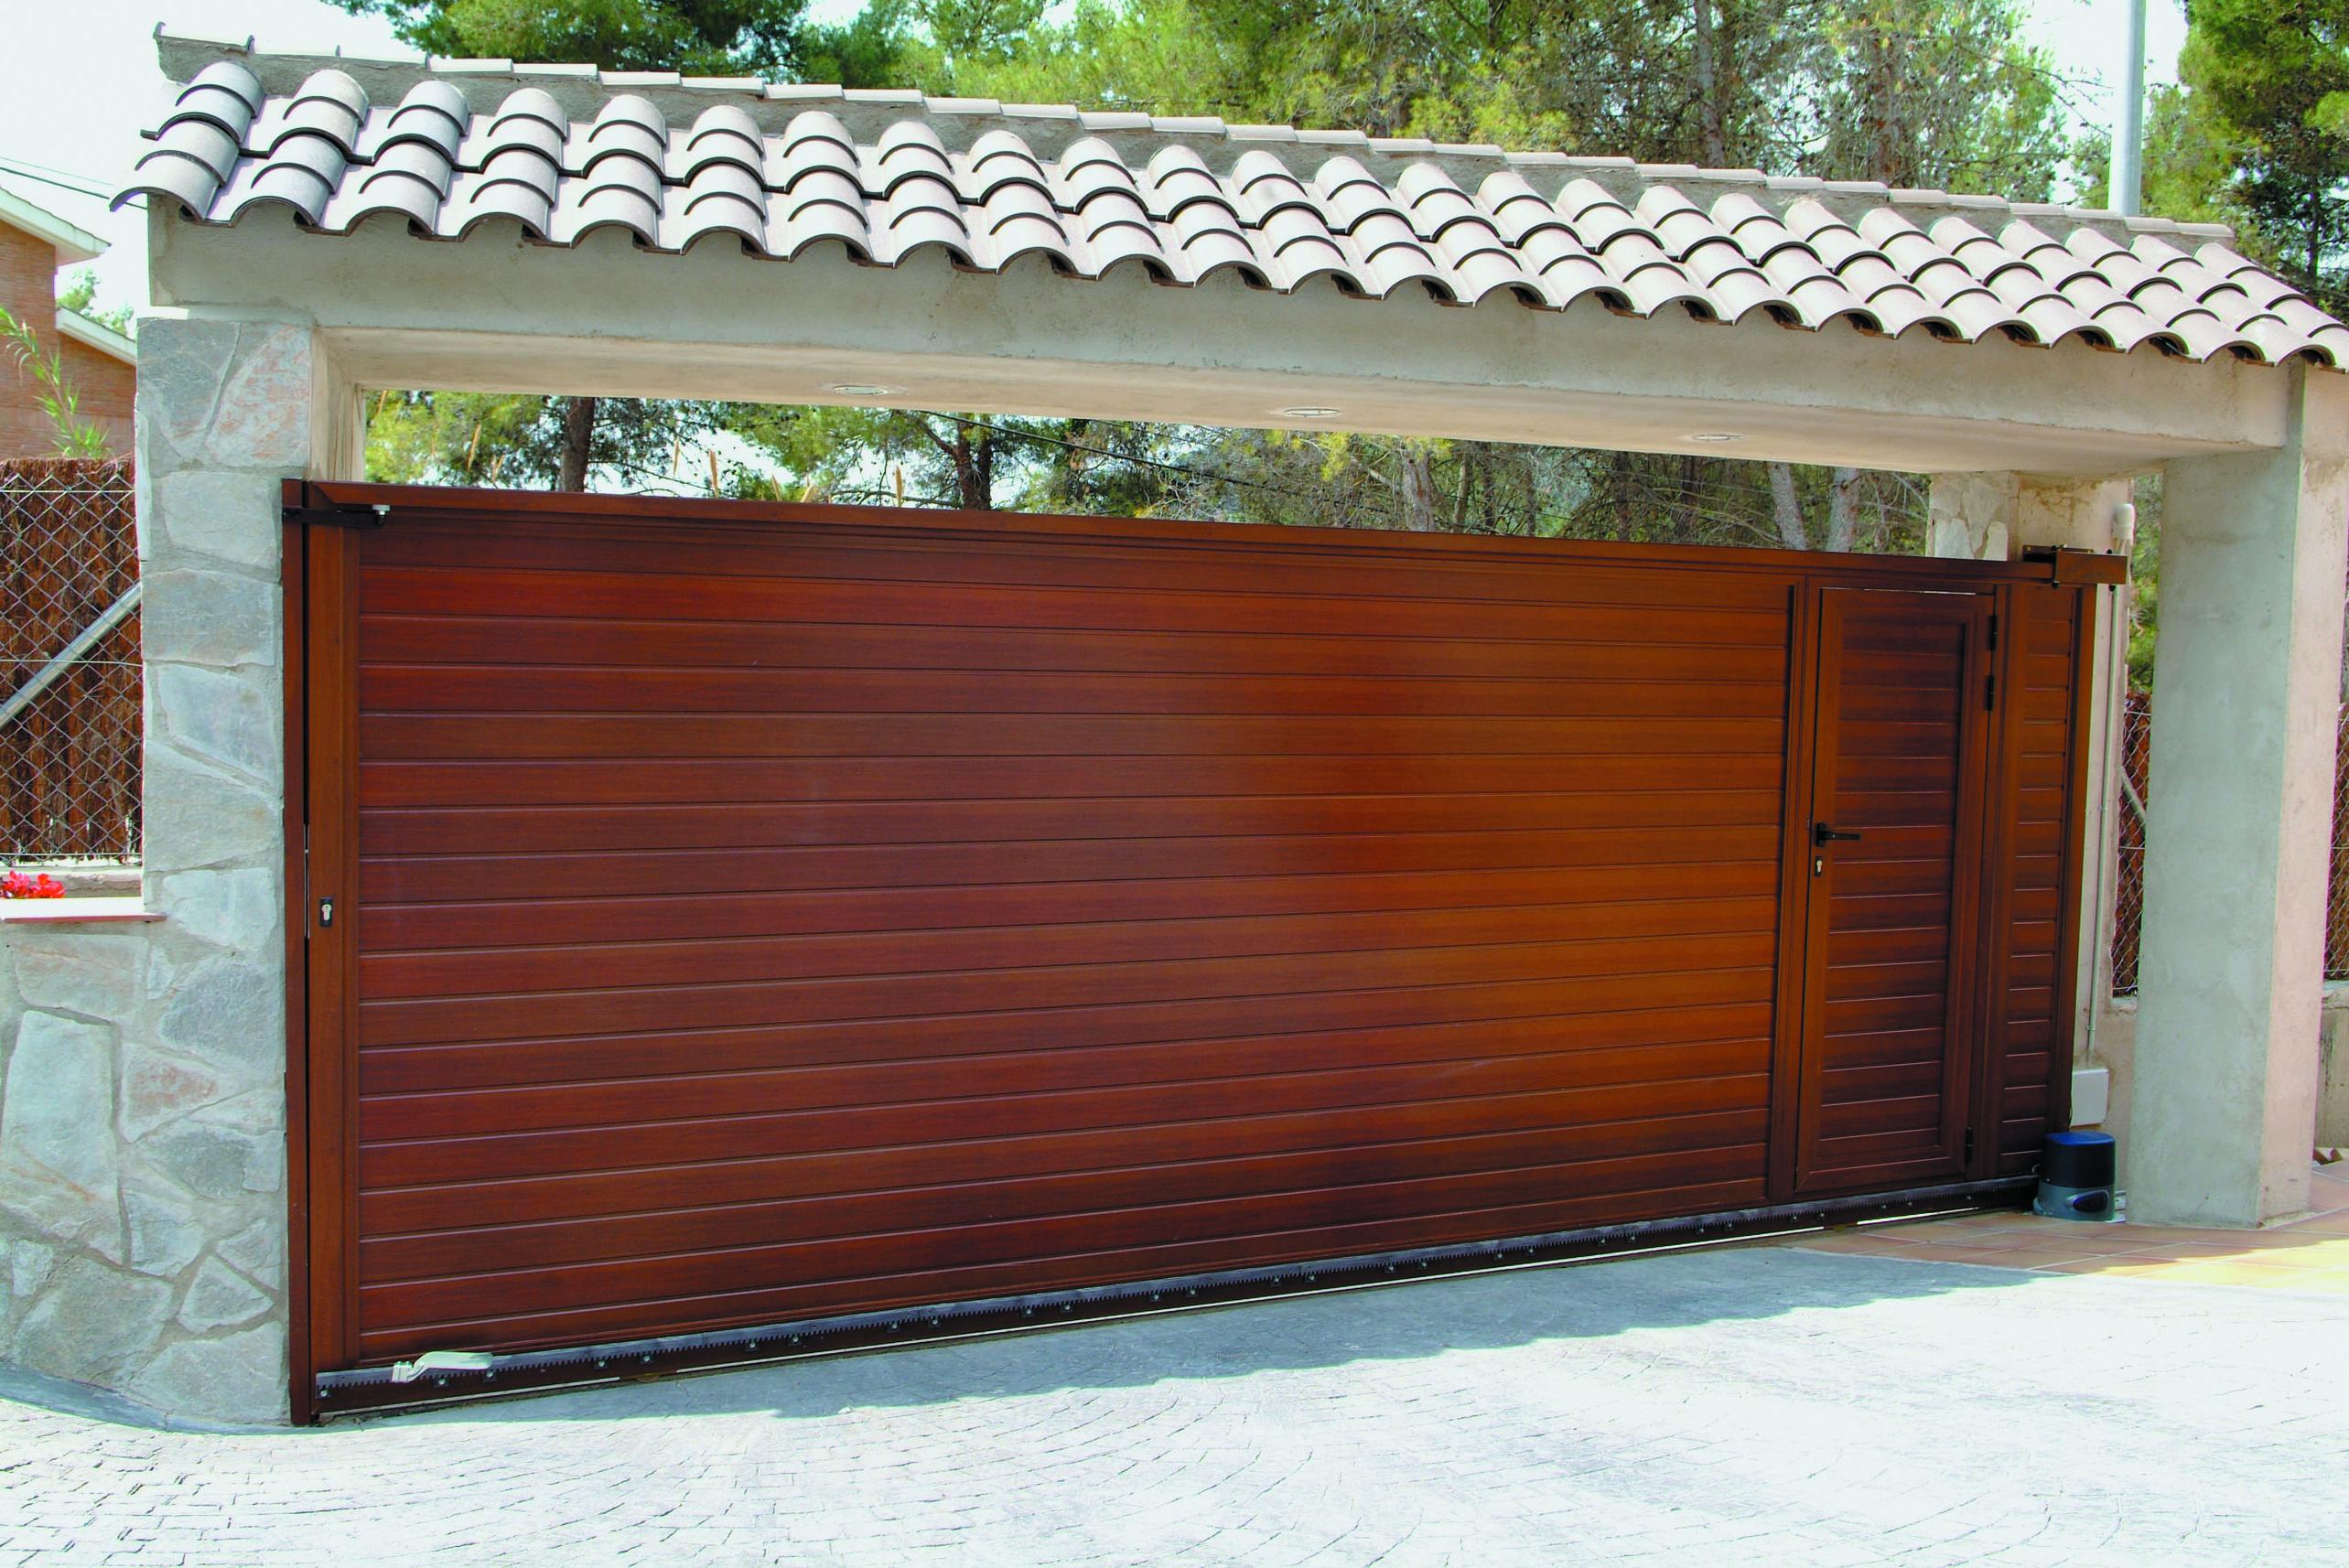 Puerta Corredera de aluminio con peatonal incorporada imitación madera